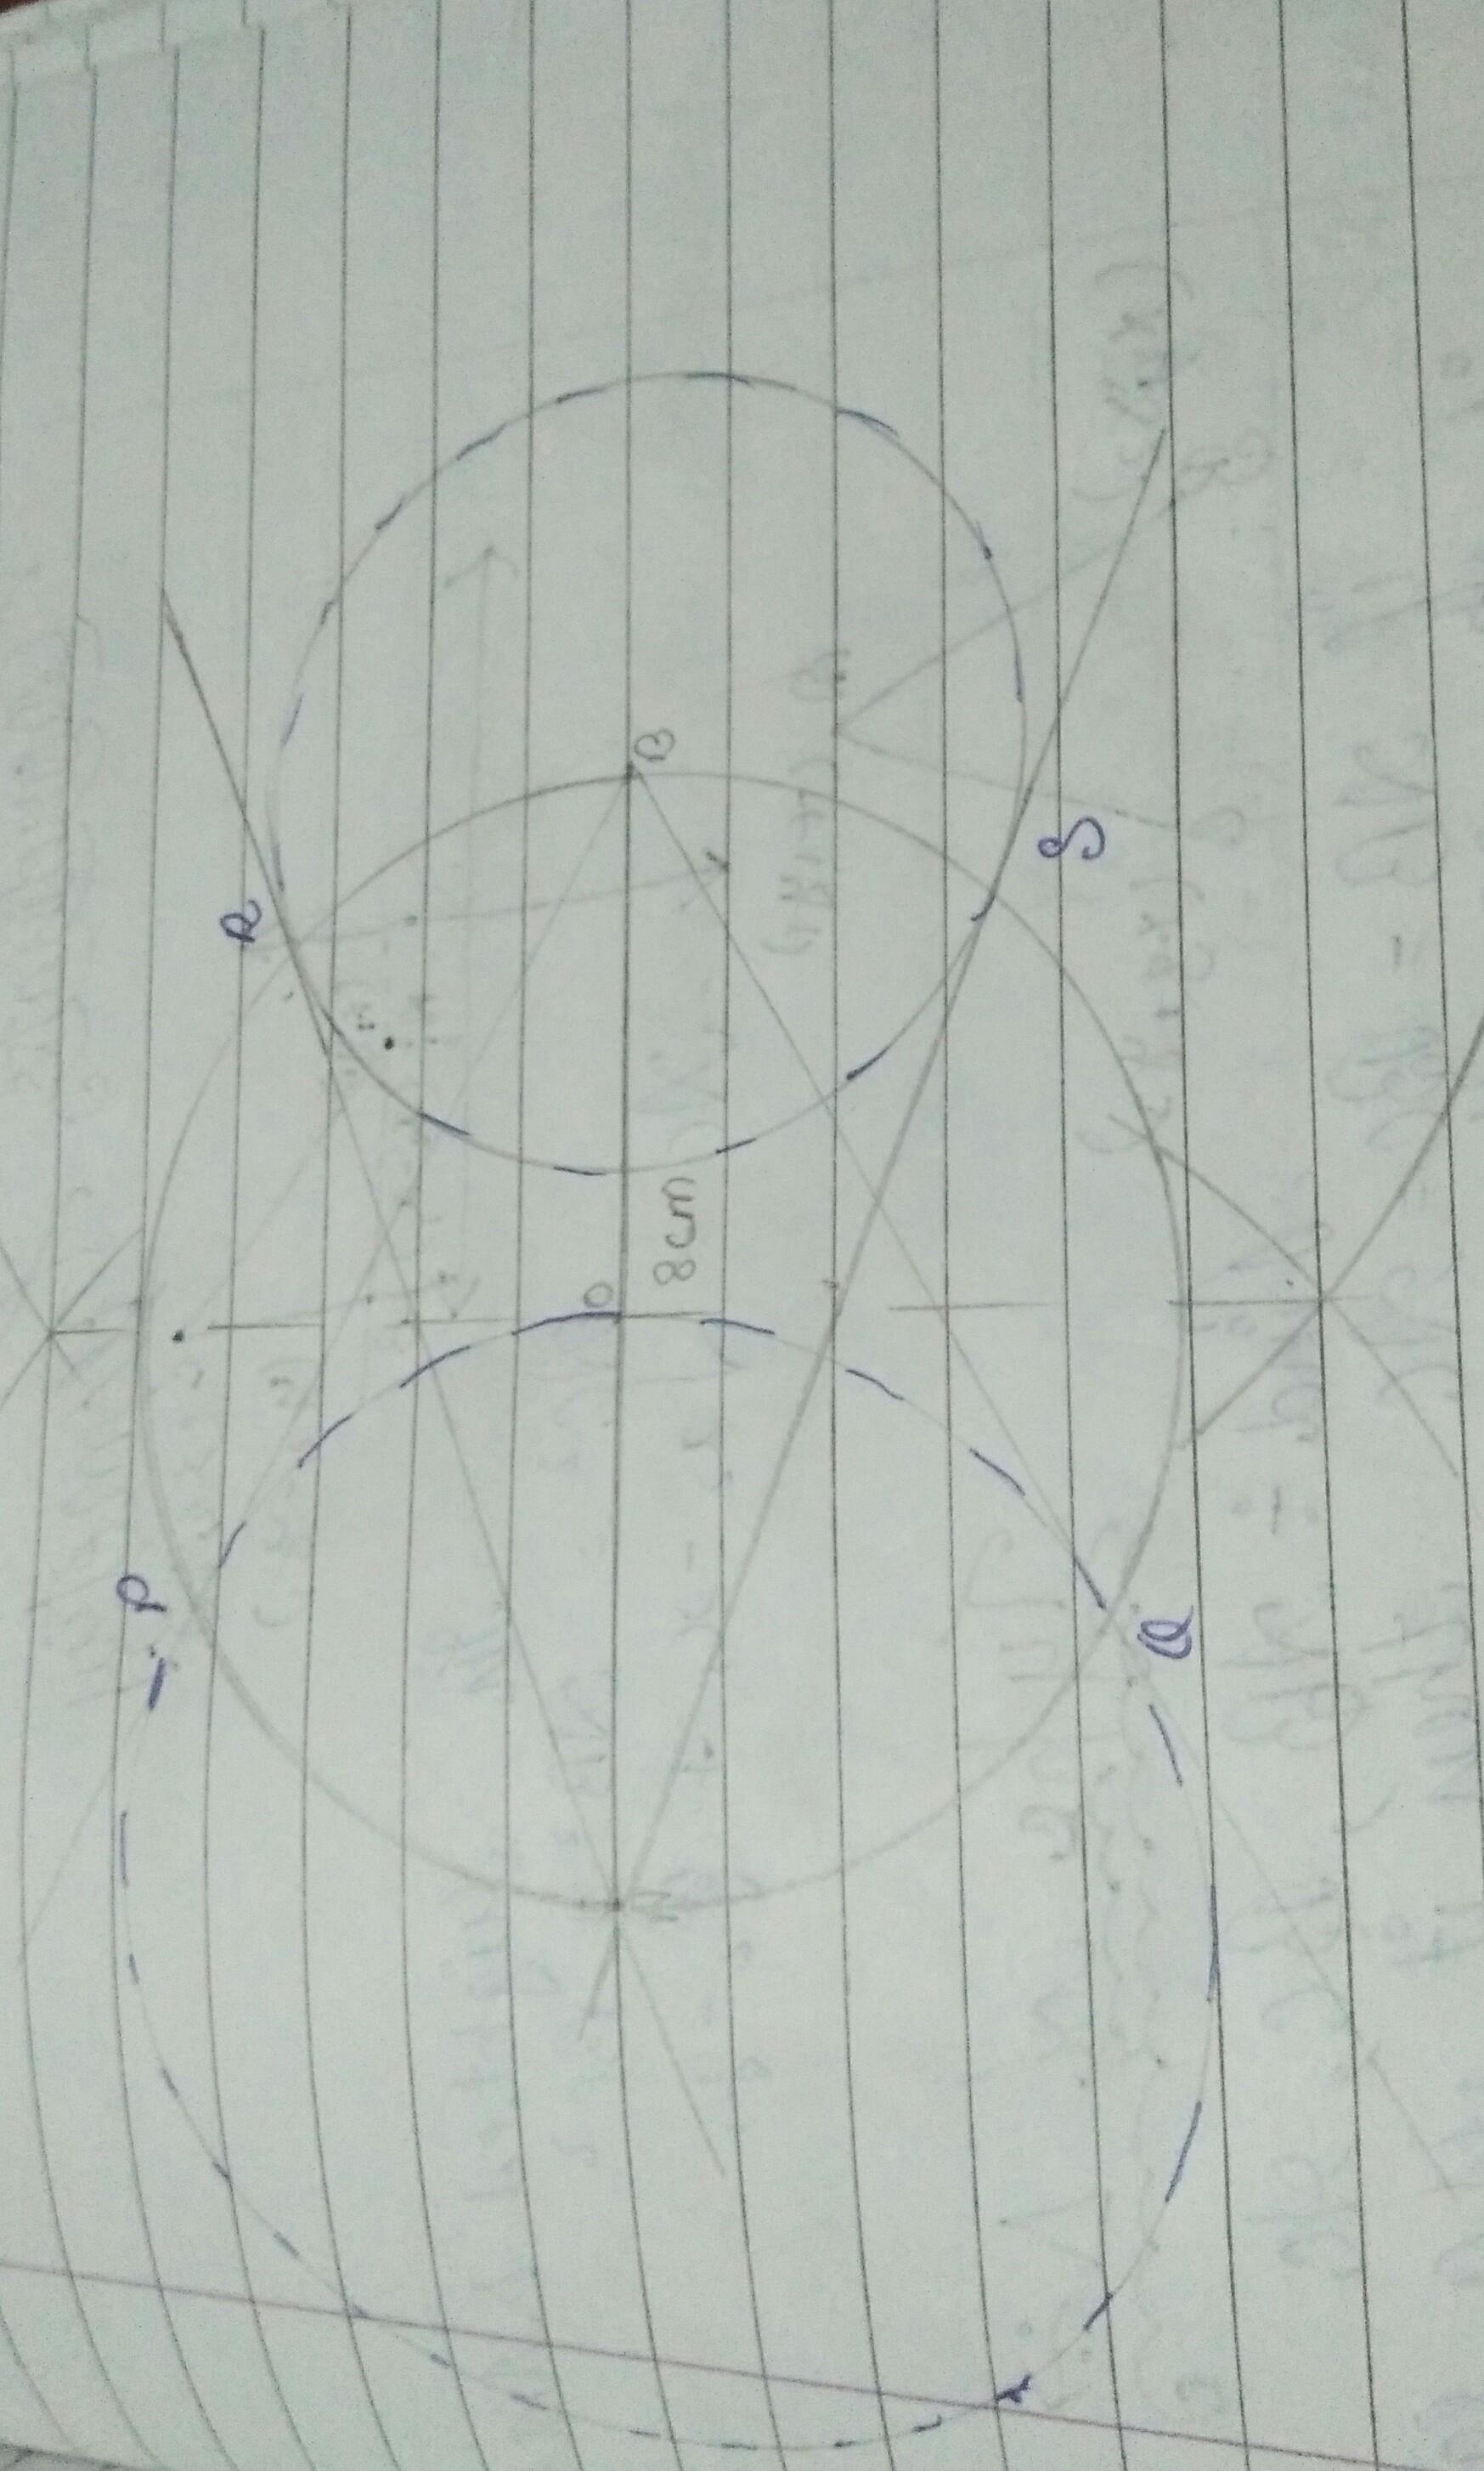 Draw A Line Segment Ab Of Length 8 Cm Taking A As Centre